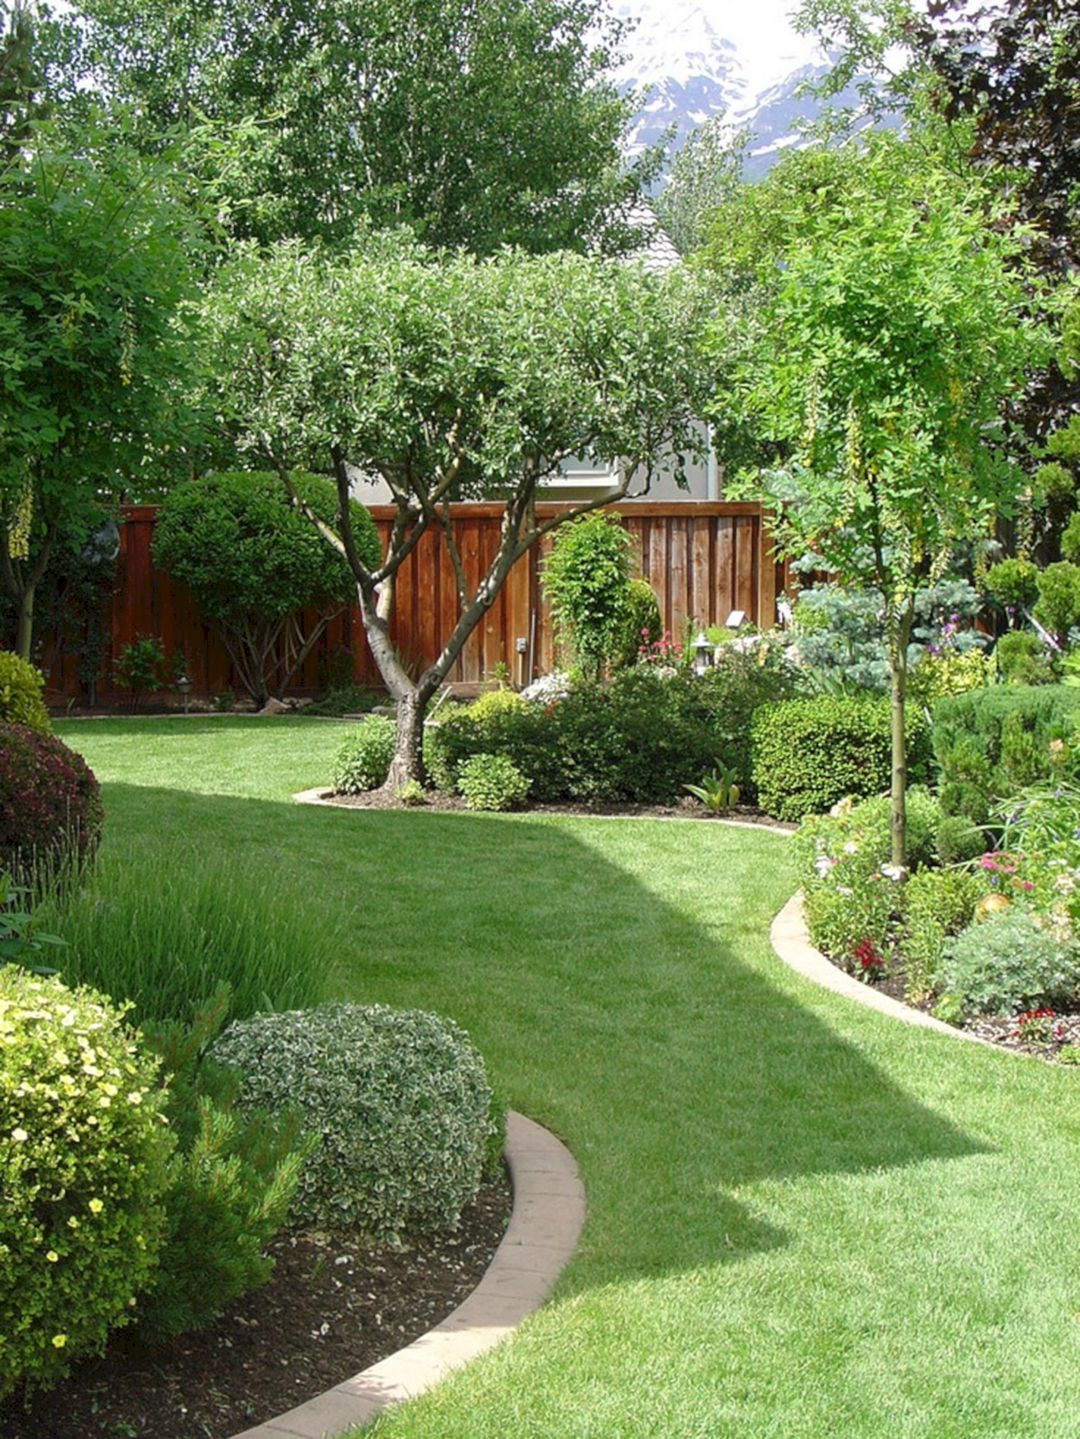 45 Gorgeous Backyard Landscape With Edging Lawn Design Ideas Freshouz Com Small Garden Landscape Small Backyard Gardens Small Backyard Landscaping